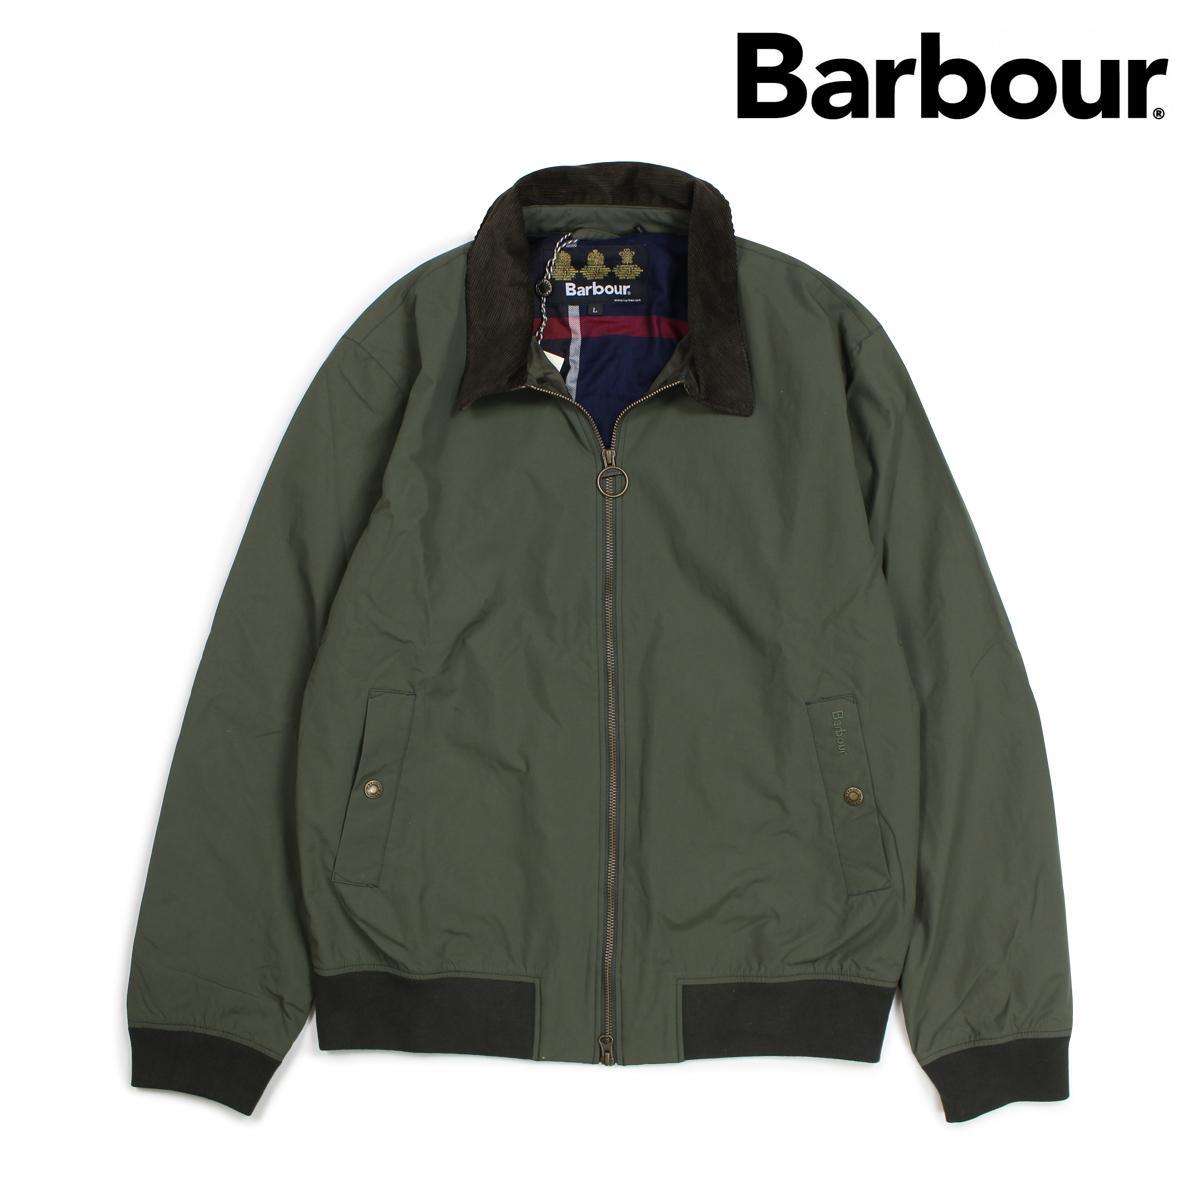 Barbour バブアー ジャケット メンズ コルサッシュ カジュアル CORPACH CASUAL JACKET オリーブ MCA0522 [9/28 新入荷]